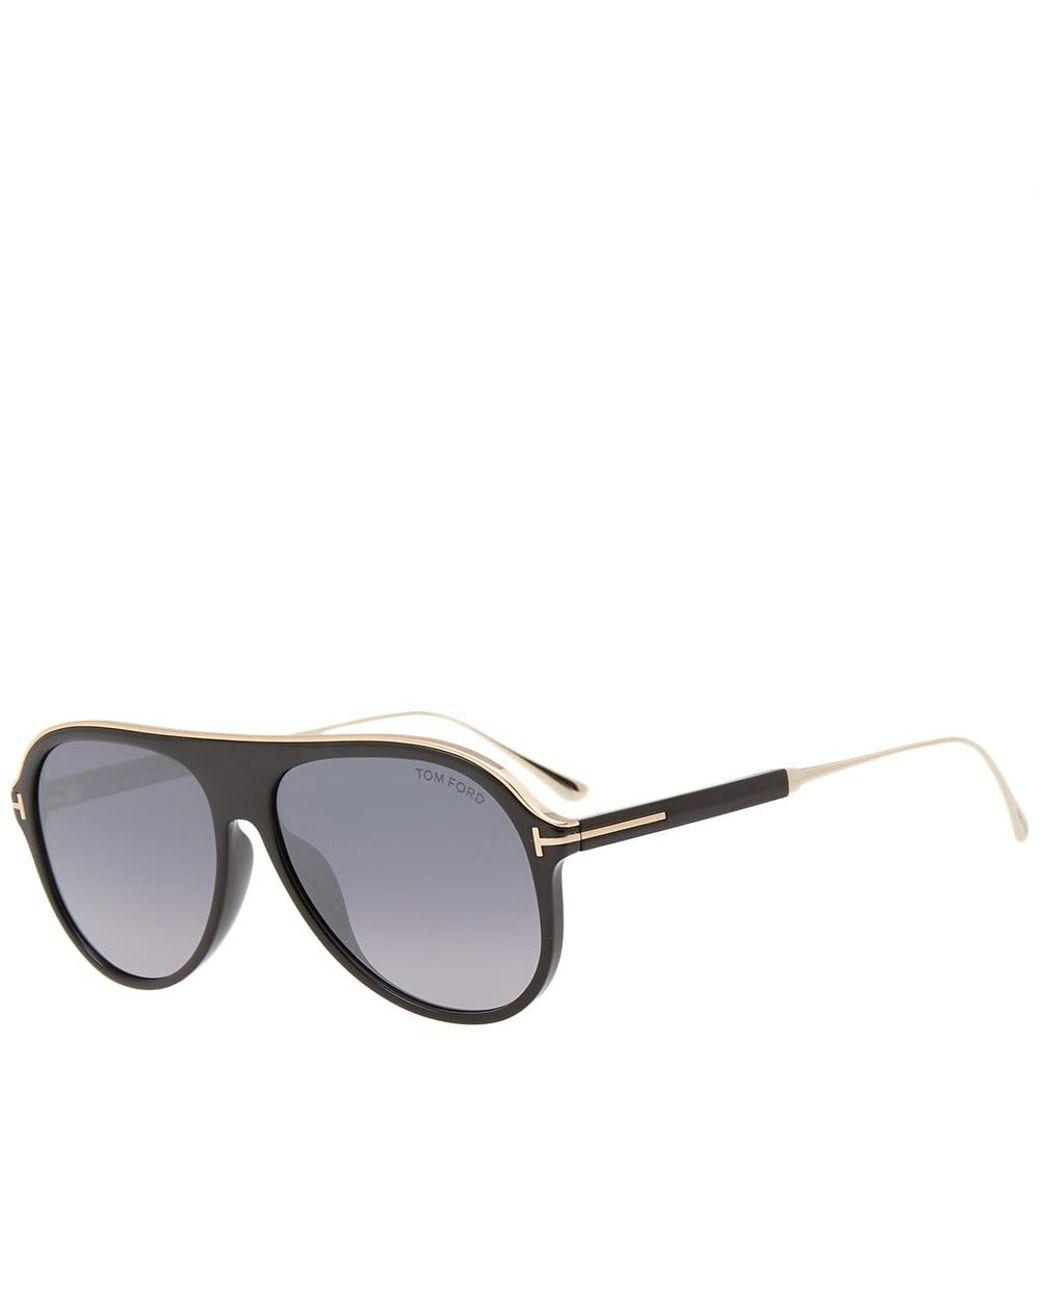 ca317450b40f Lyst - Tom Ford Tom Ford Ft0624 Nicholai-02 Sunglasses in Black for Men